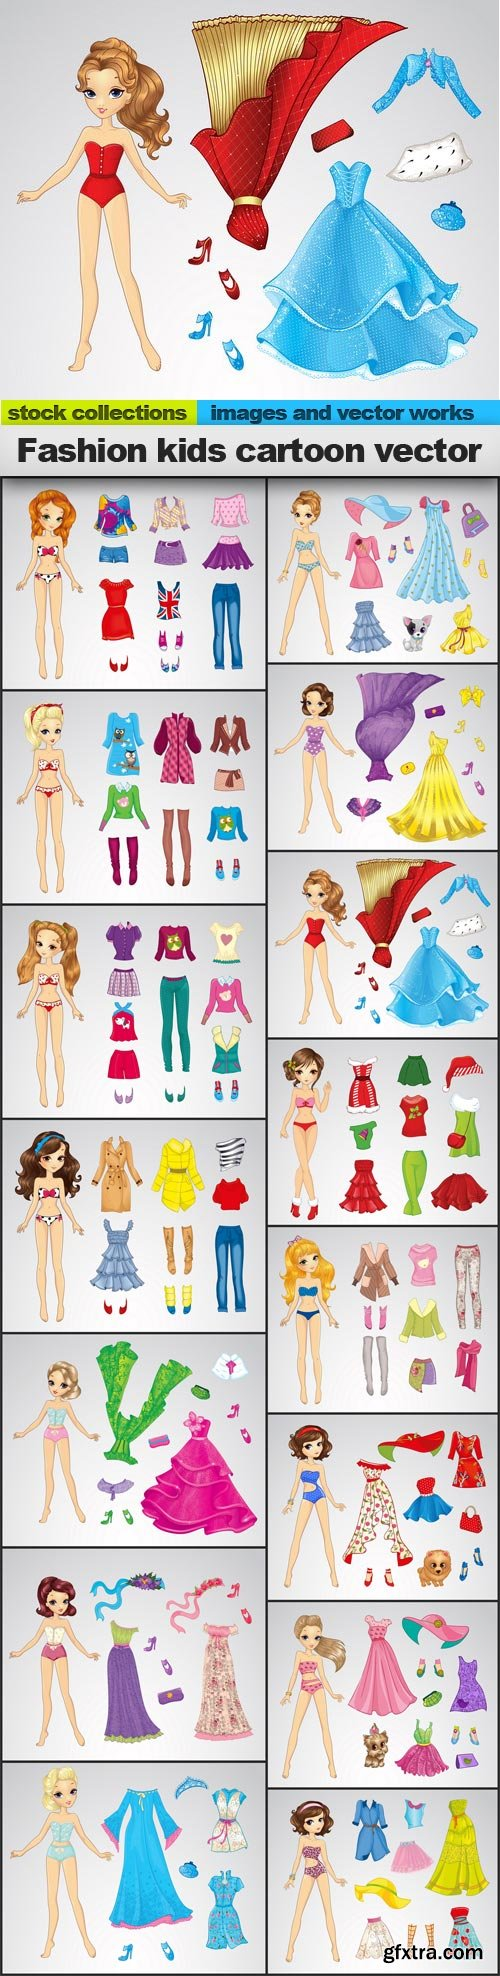 Fashion kids cartoon vector, 15 x EPS